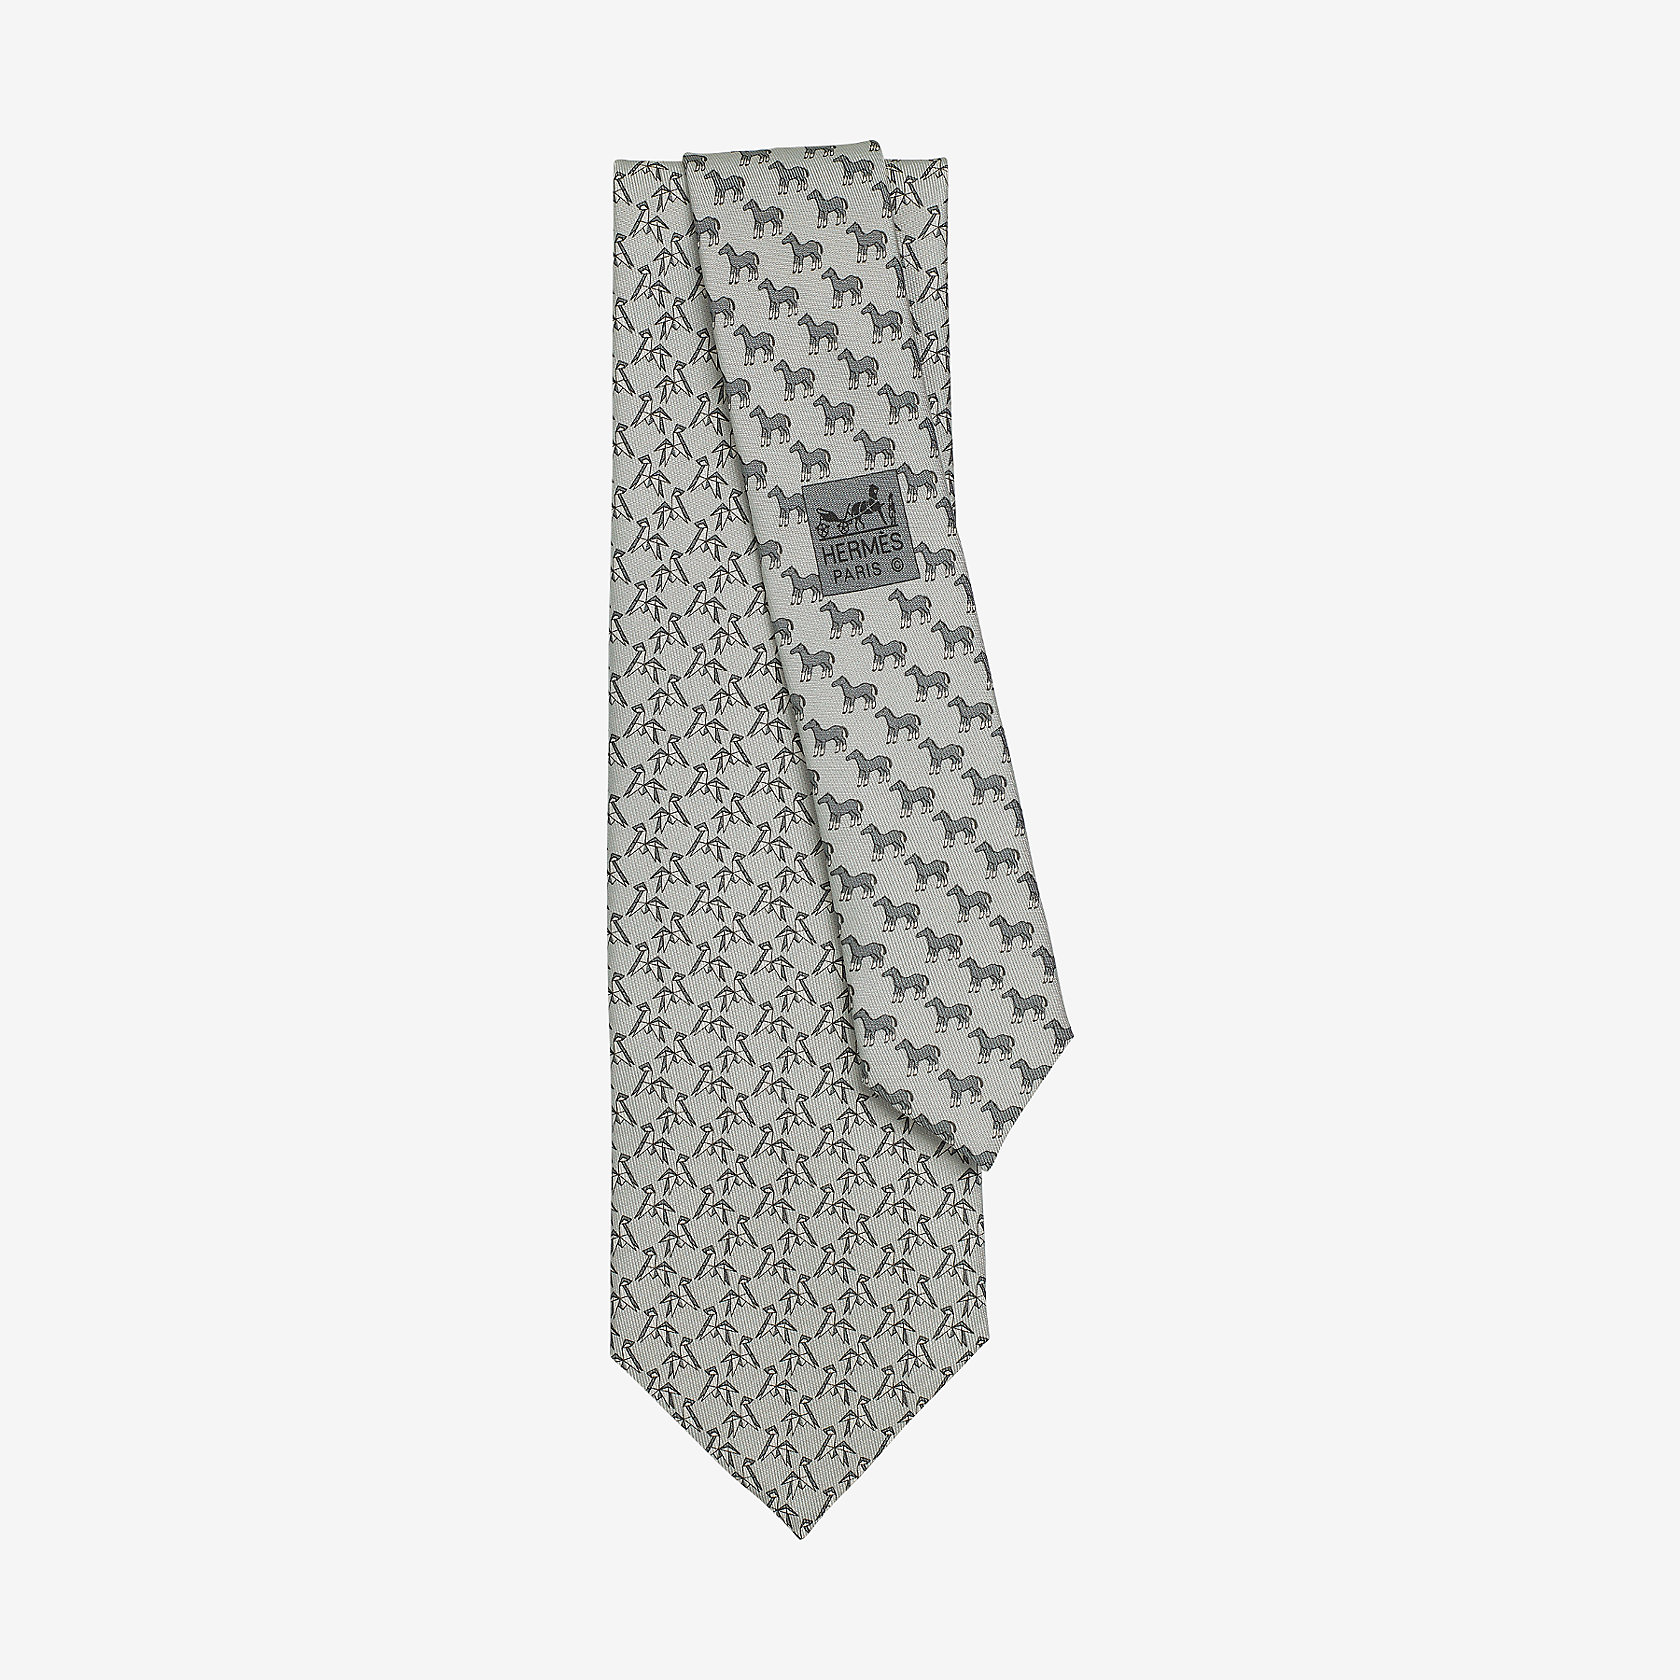 Twillbi Origami Horse Tie